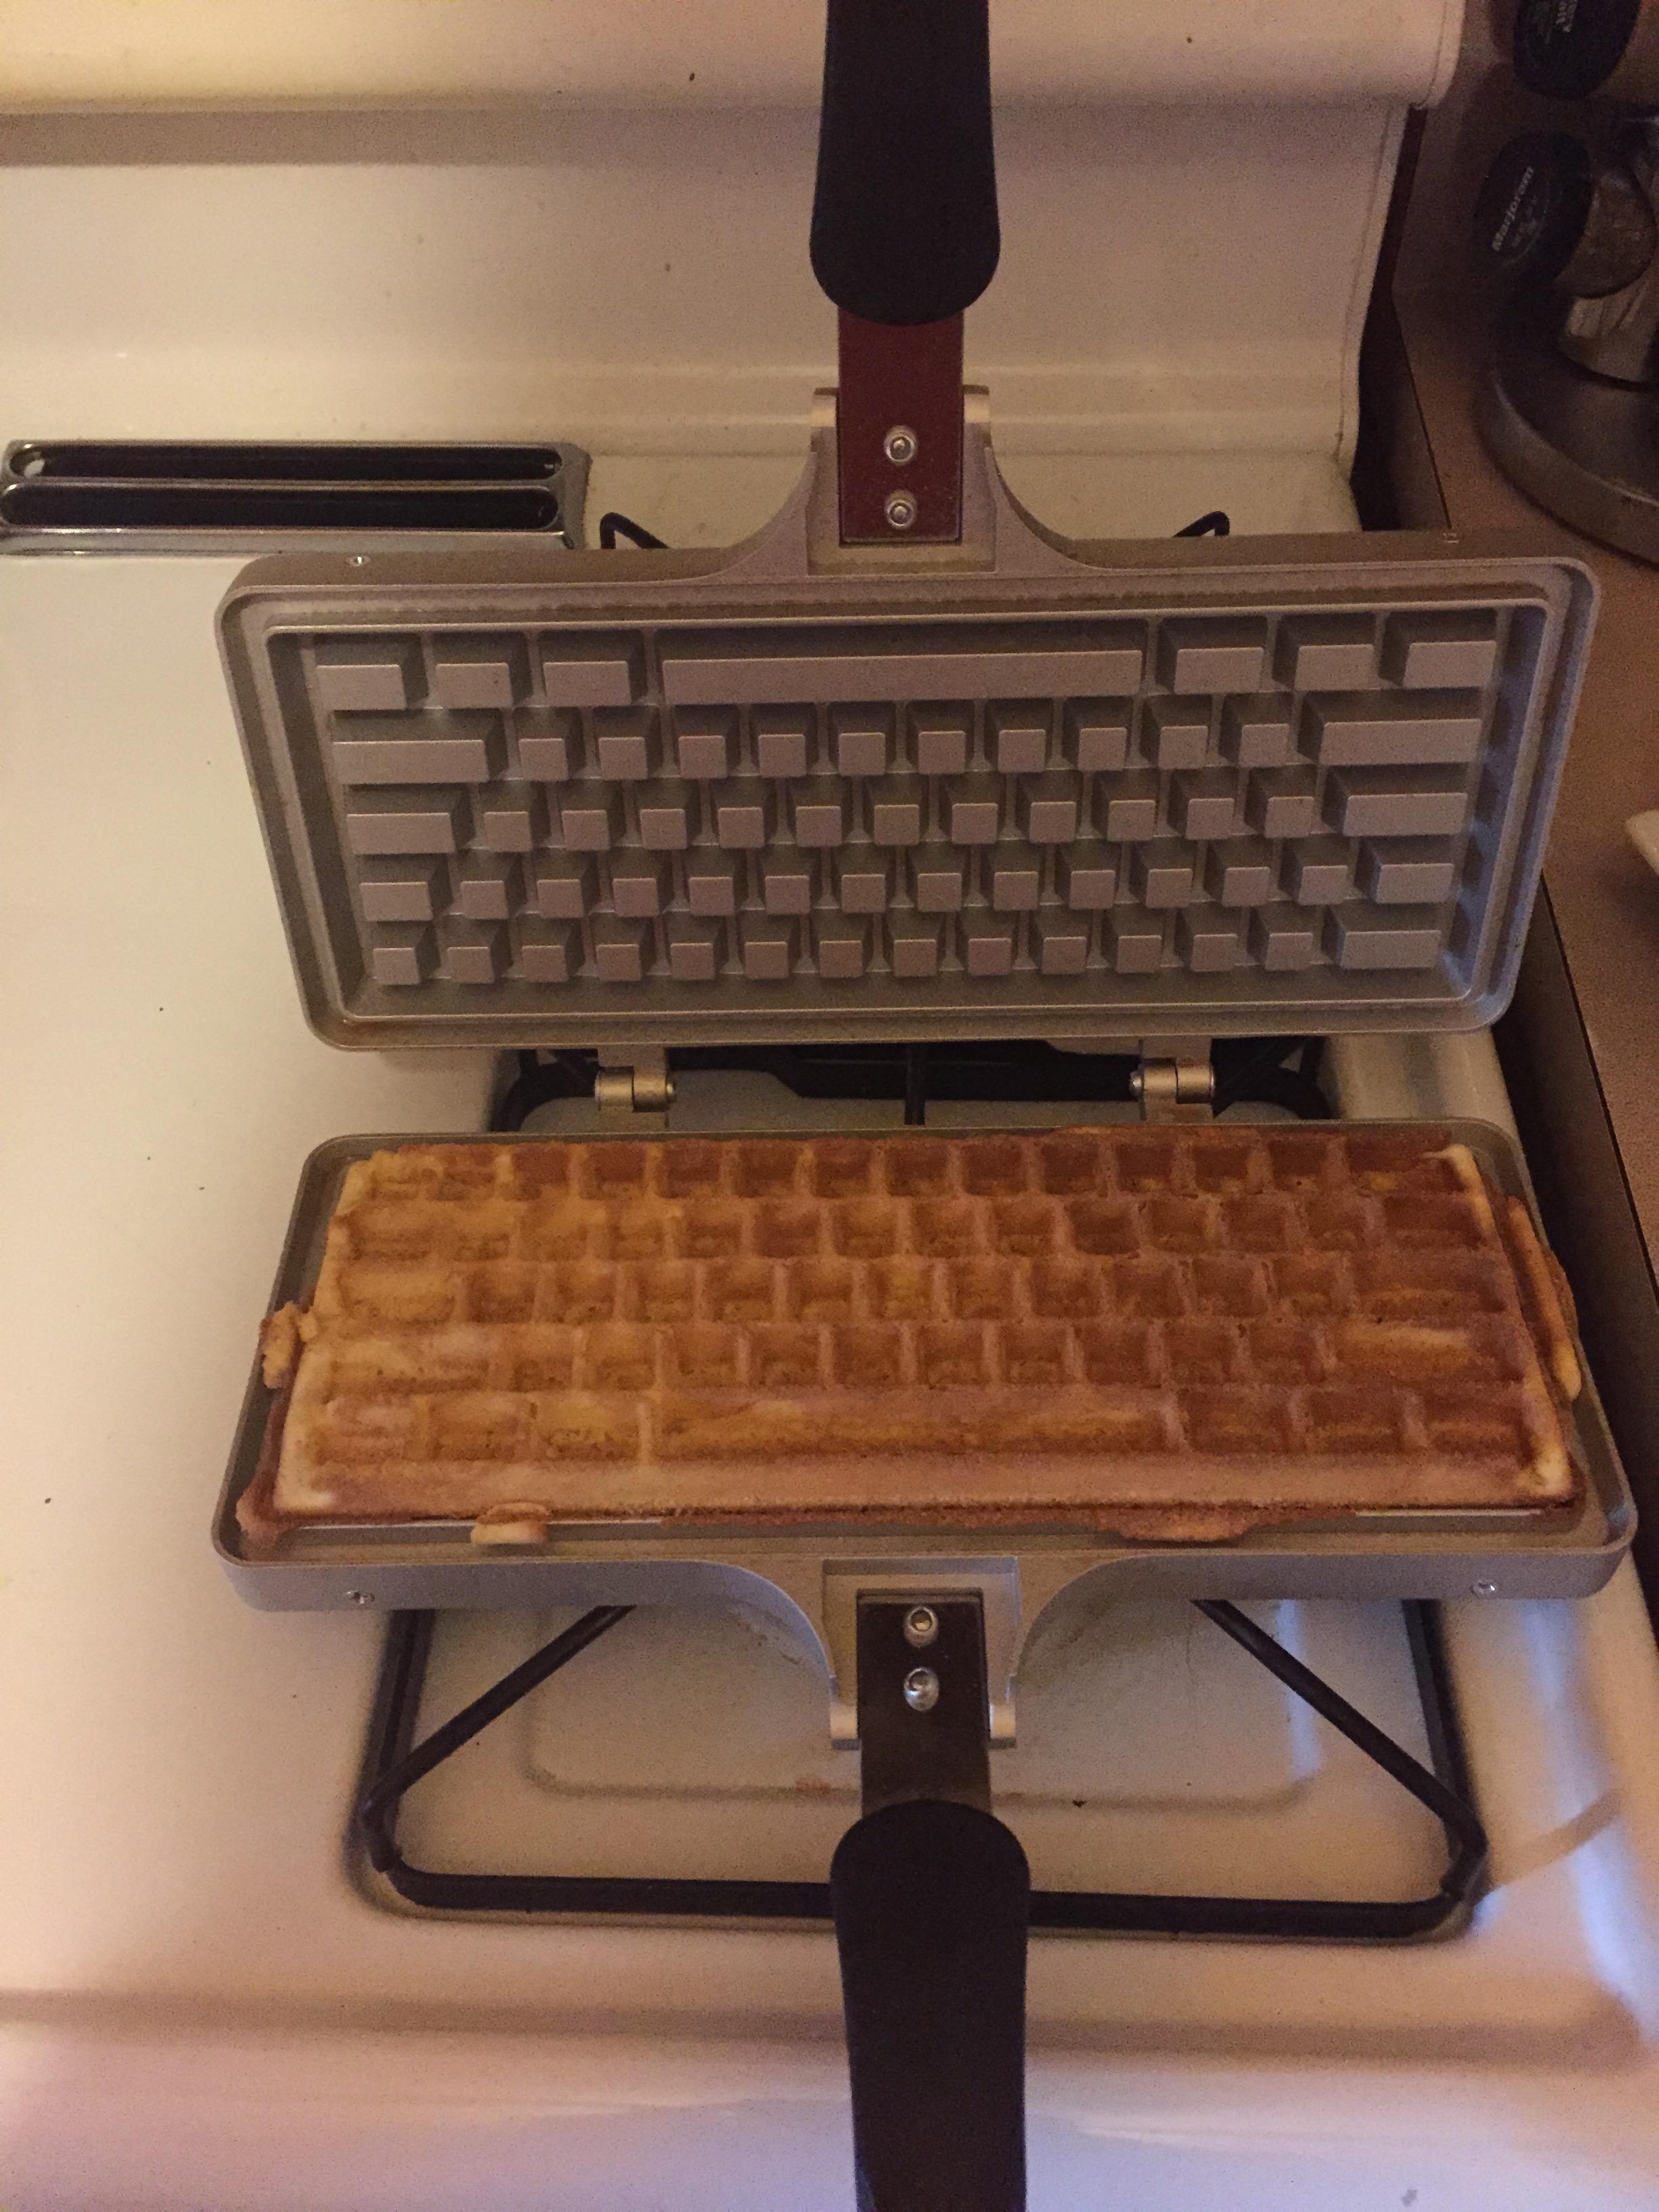 Finished Waffles Look Like A Computer Keyboard!